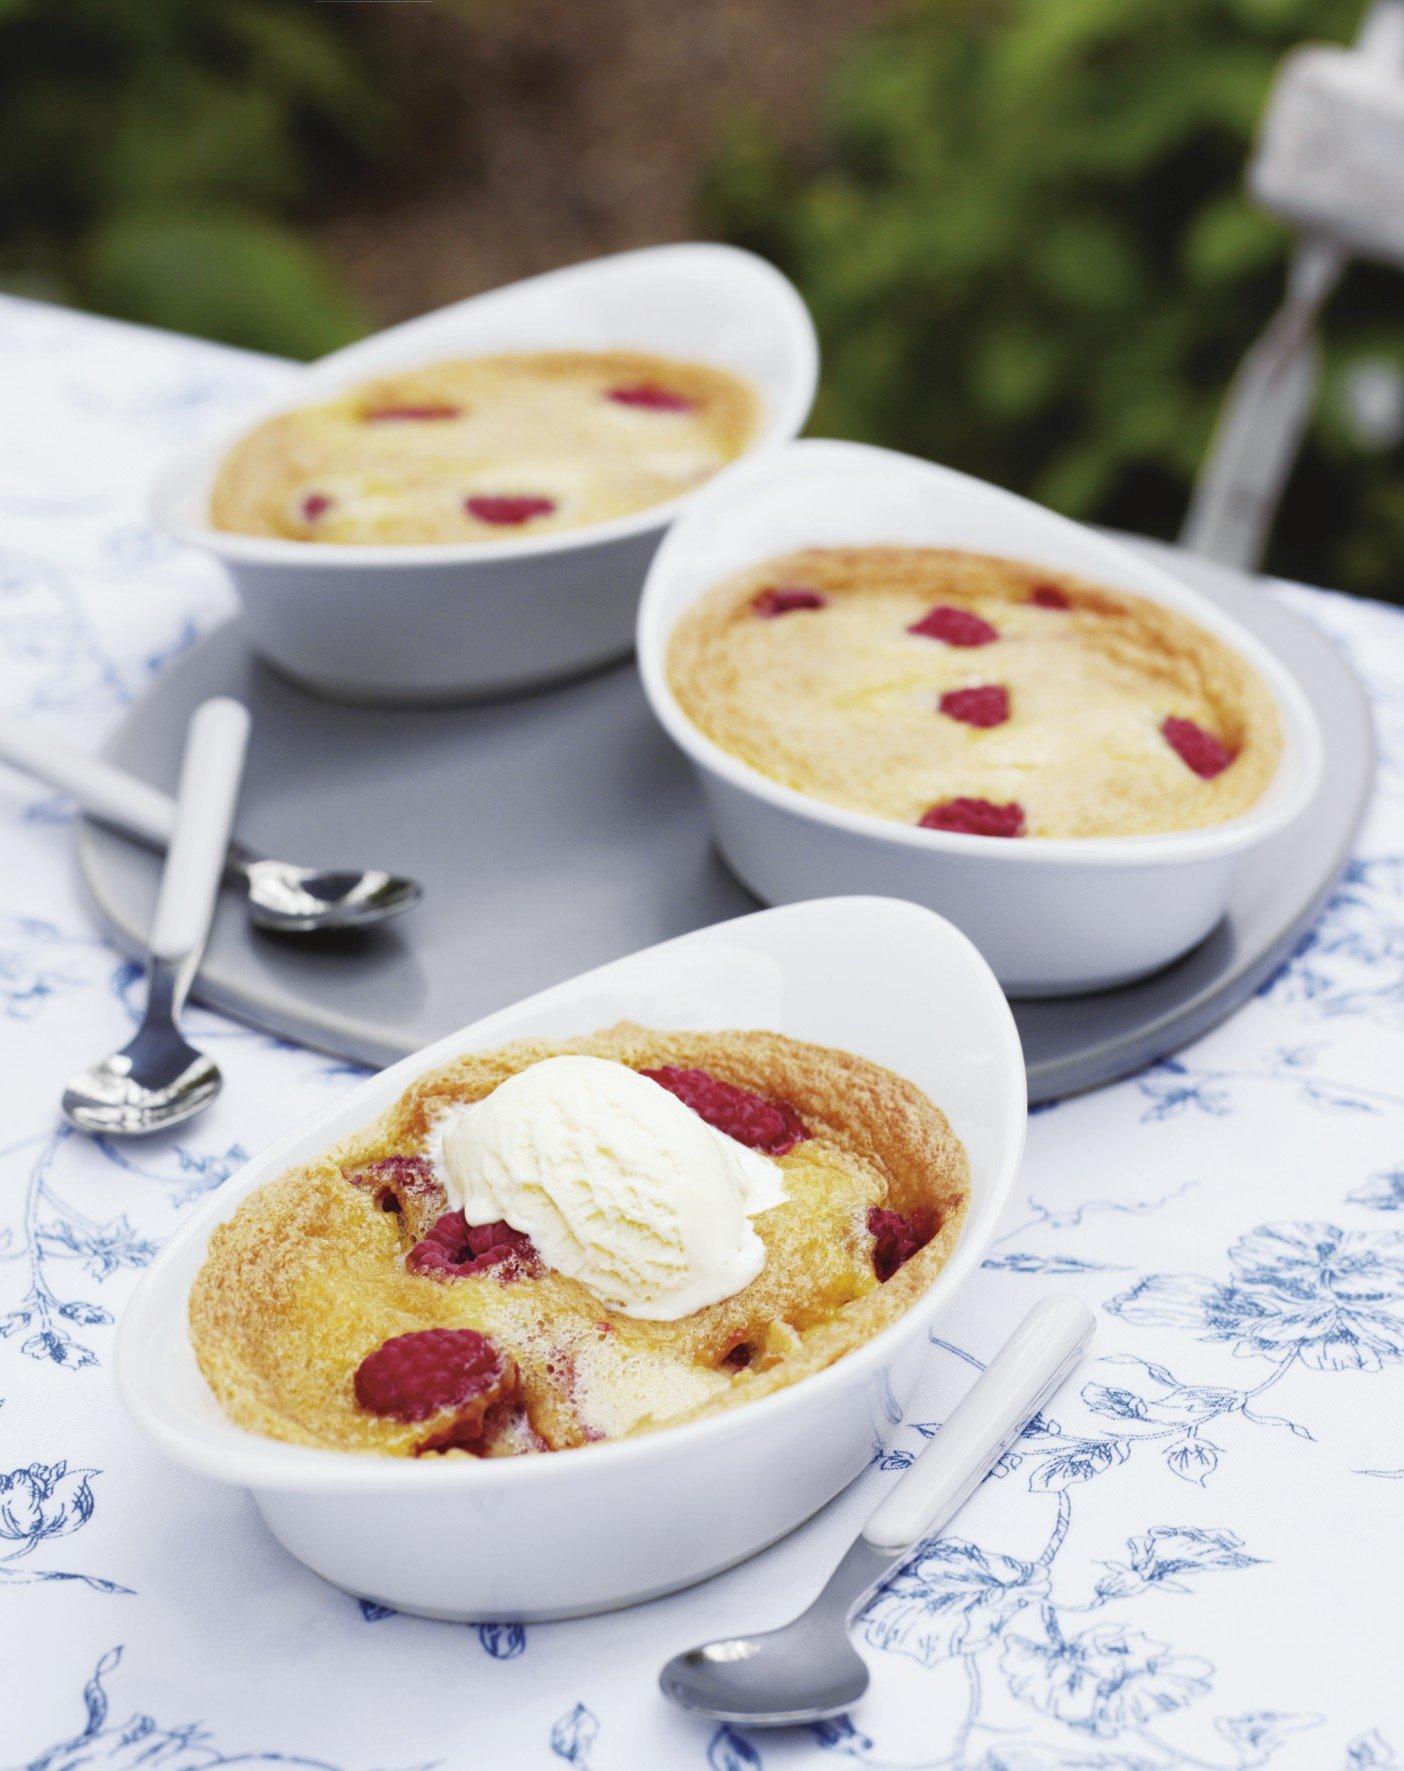 Recipe: Raspberry Clafoutis With Ground Almonds